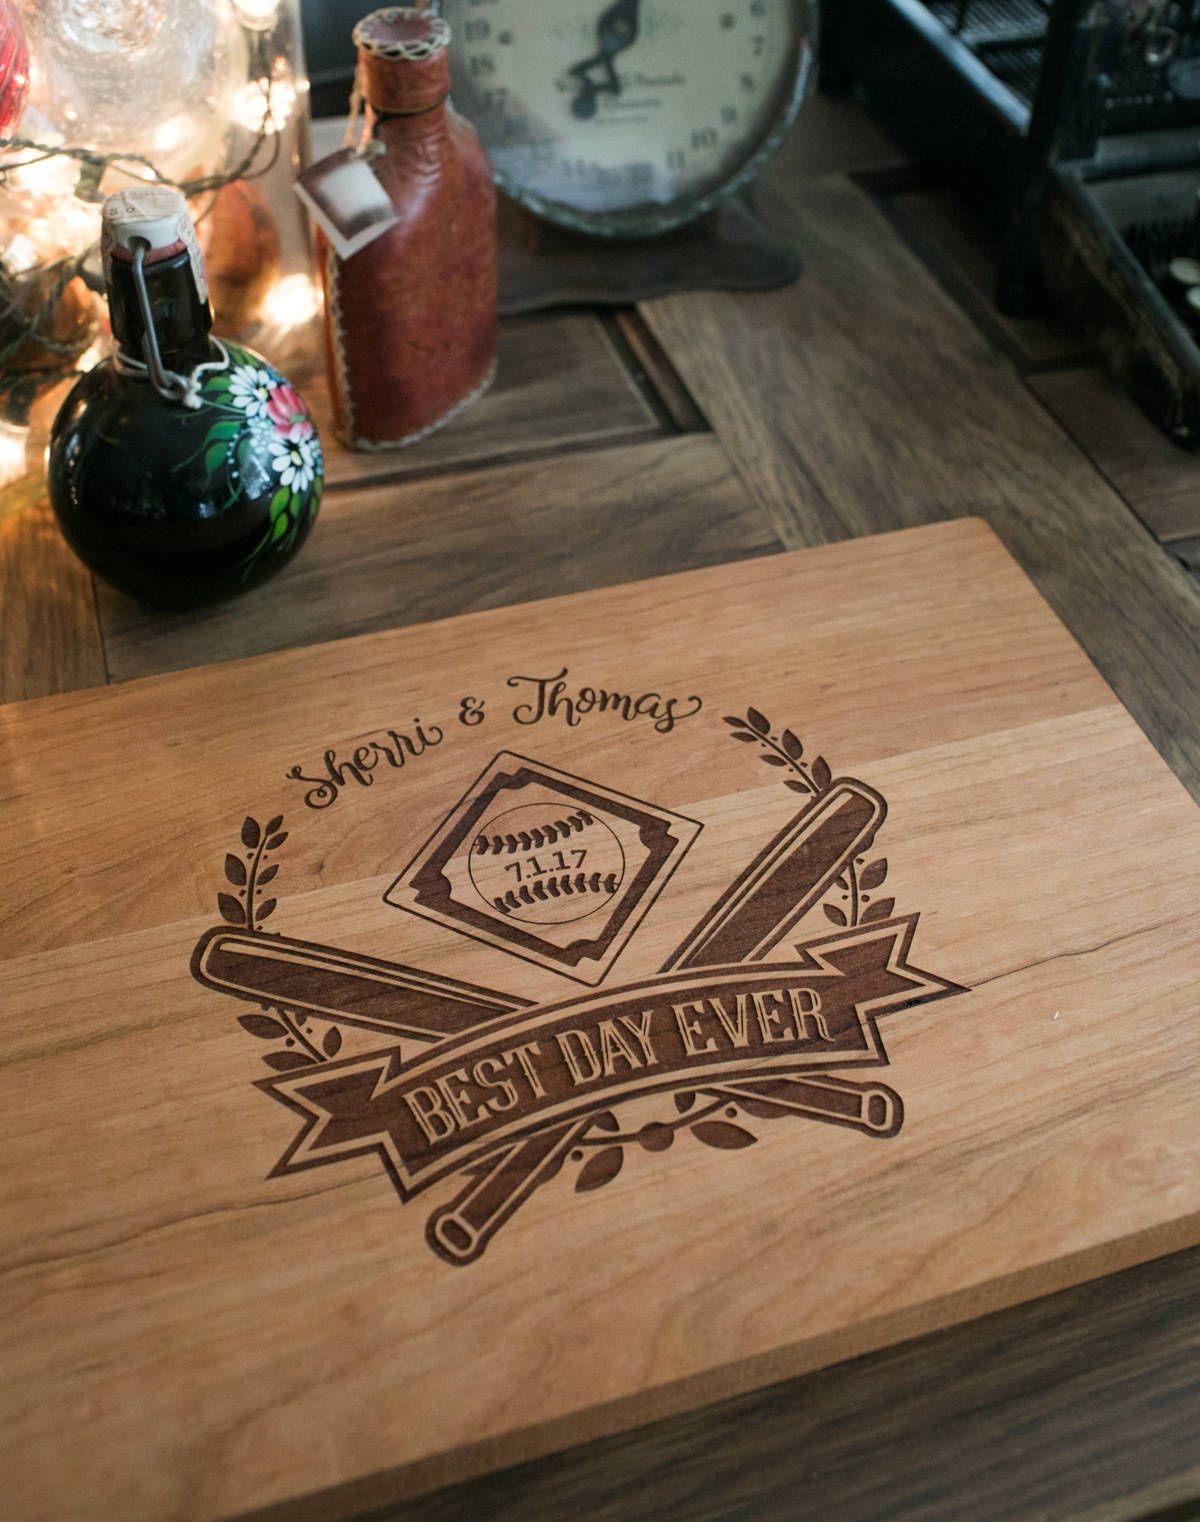 wedding theme baseball cutting board design best day ever